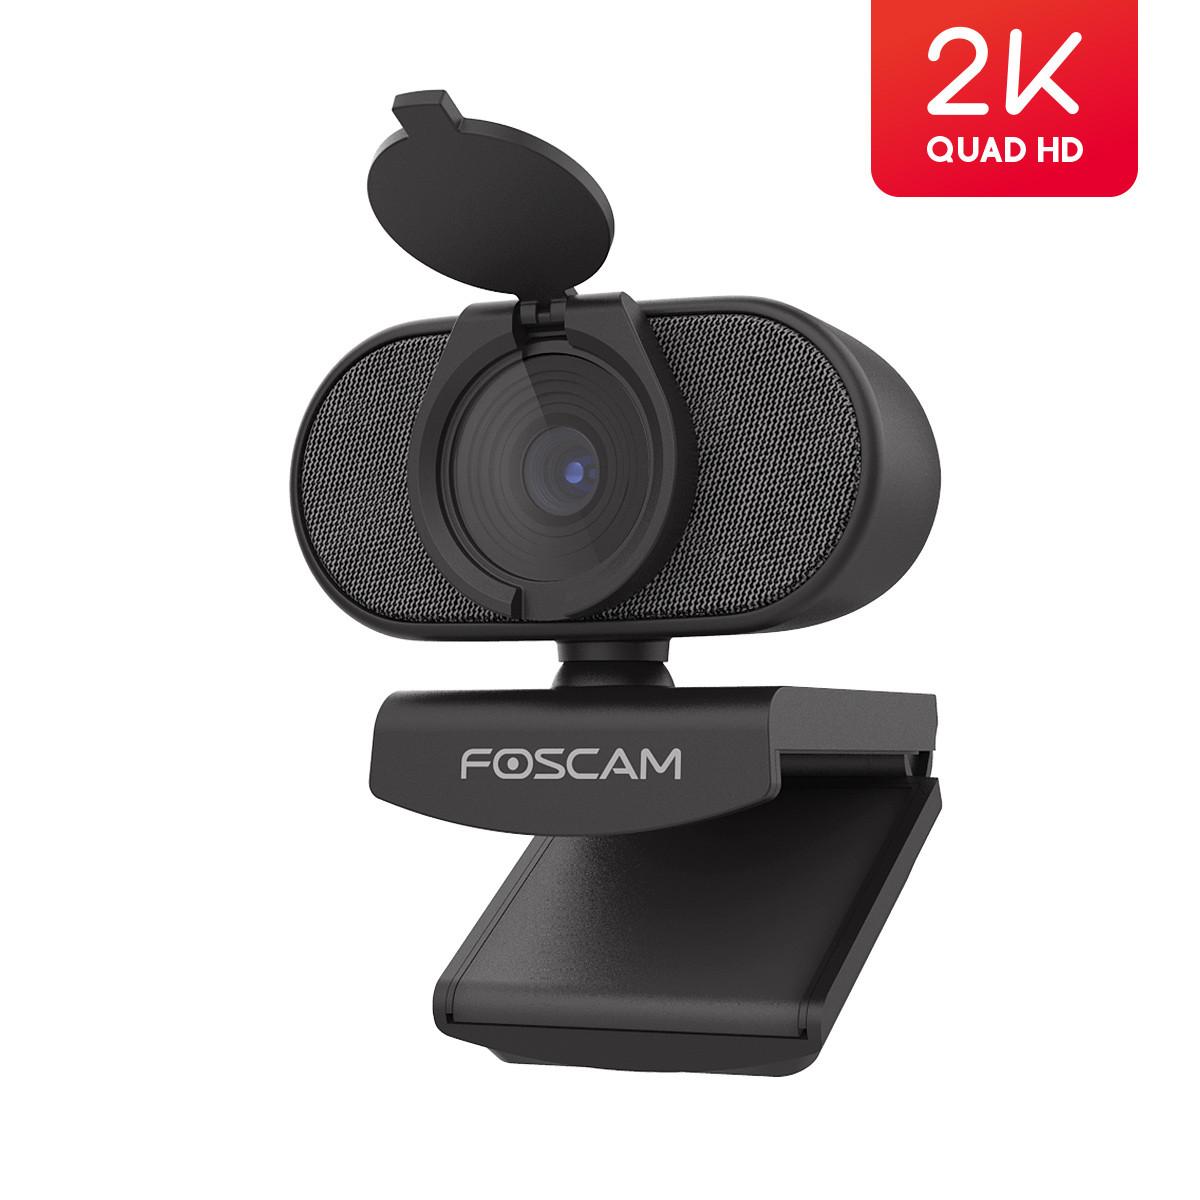 Веб-камера 2K QUAD HD 2688*1520 (4.0 M Pixels) стерео мікрофони професійна стриминговая вебкамера з